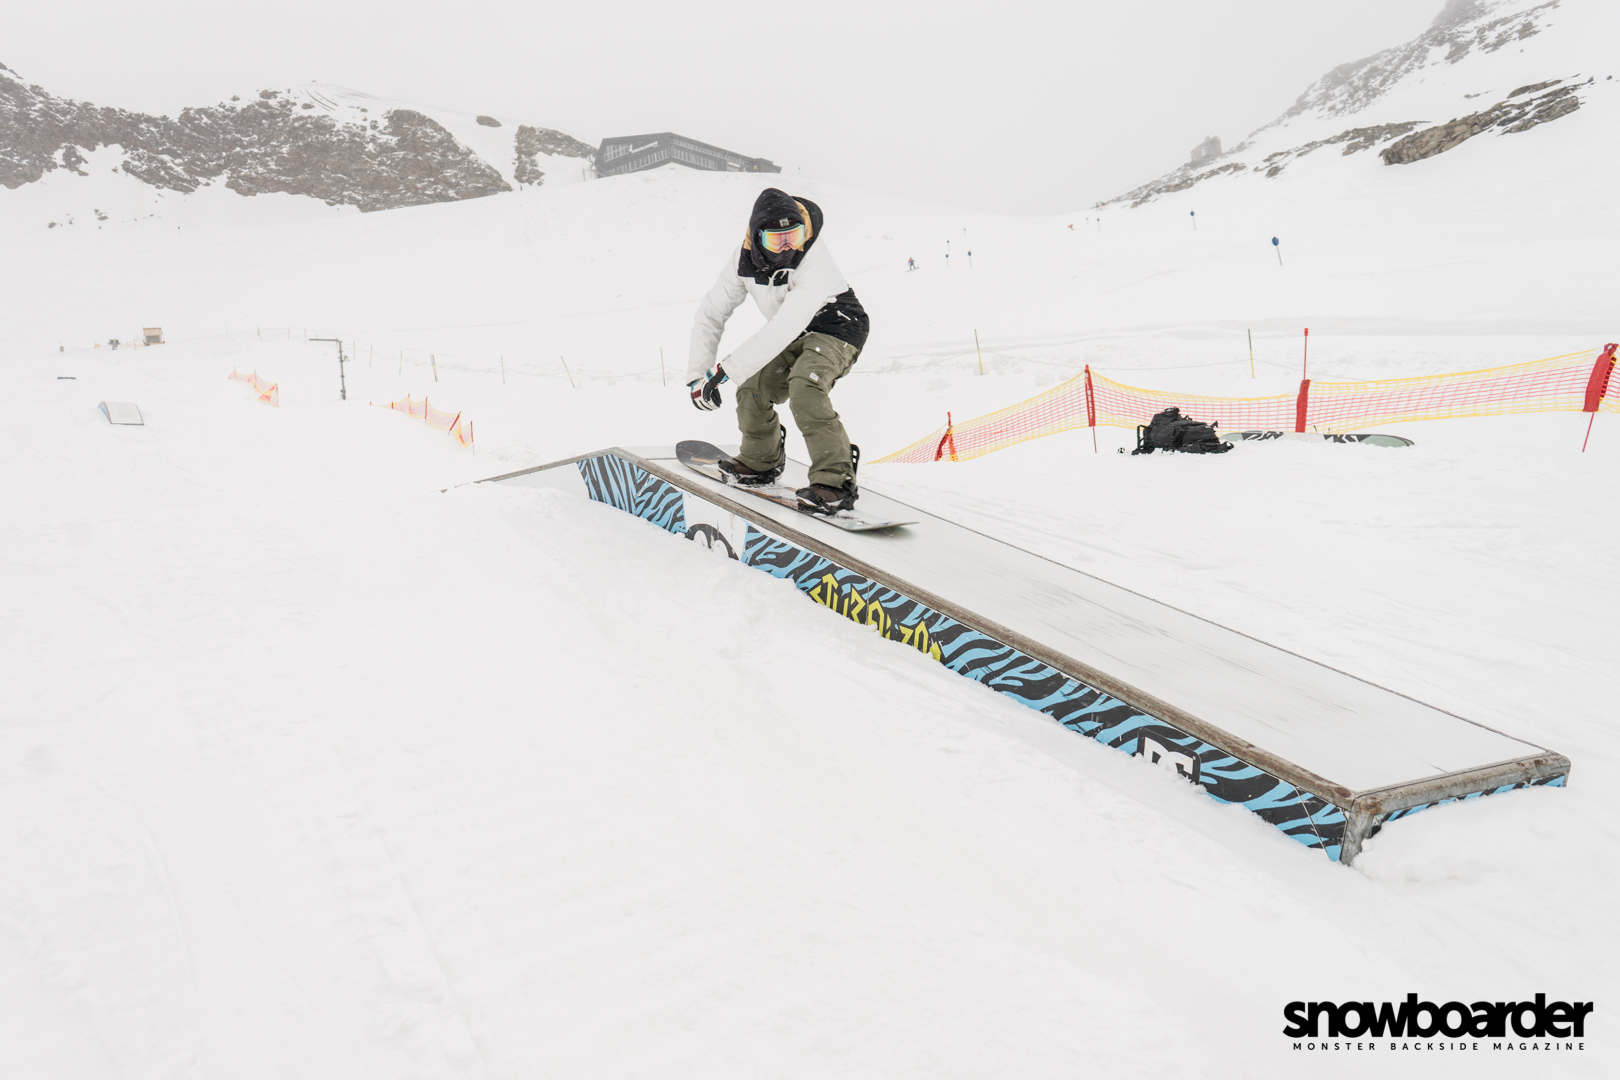 snowboardermbm-4